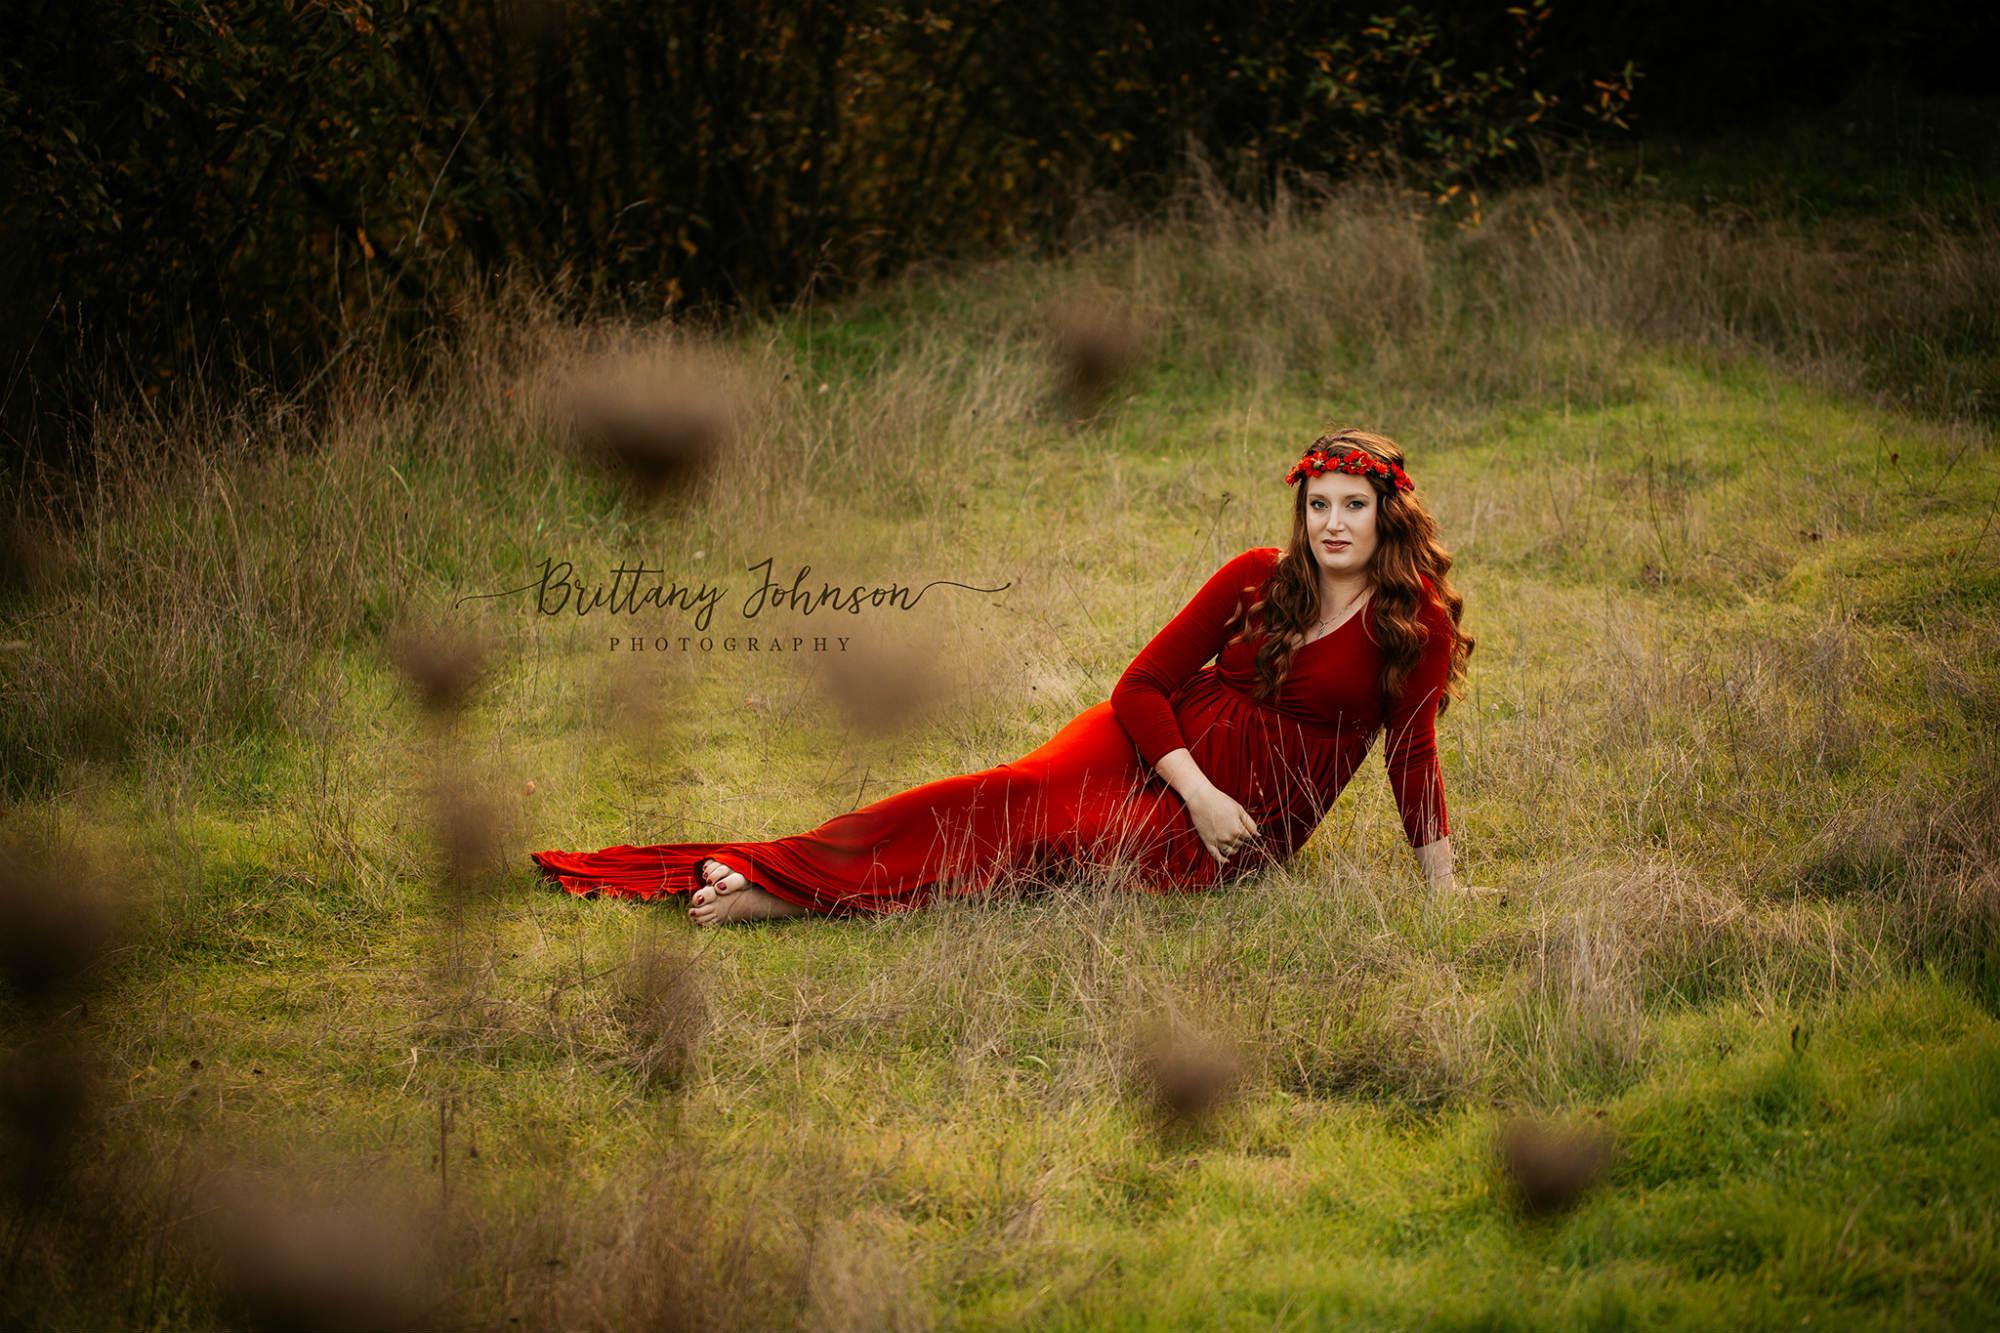 portrait photography tips image